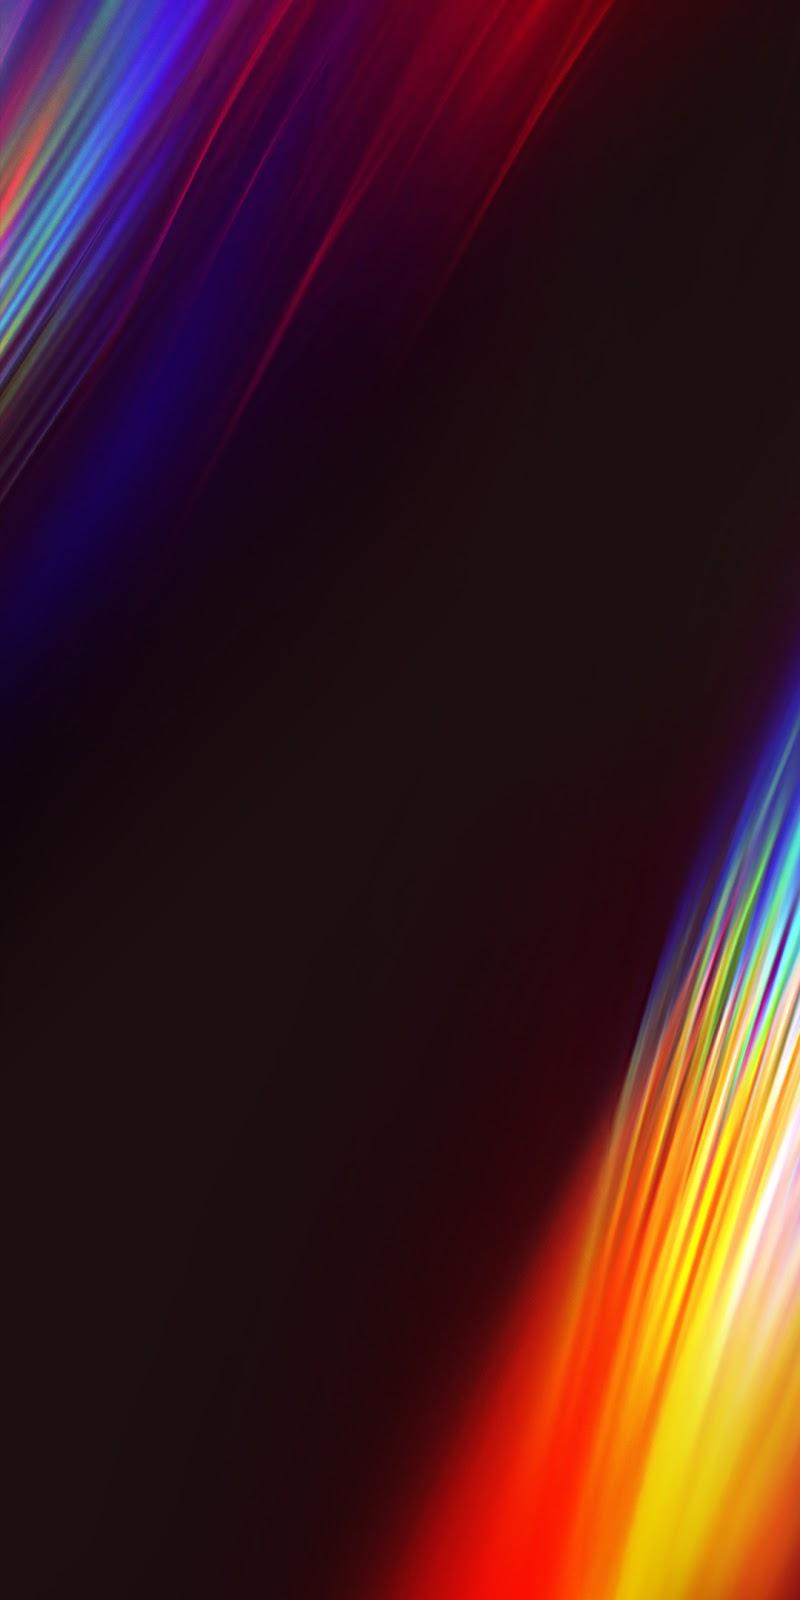 Phone background wallpaper